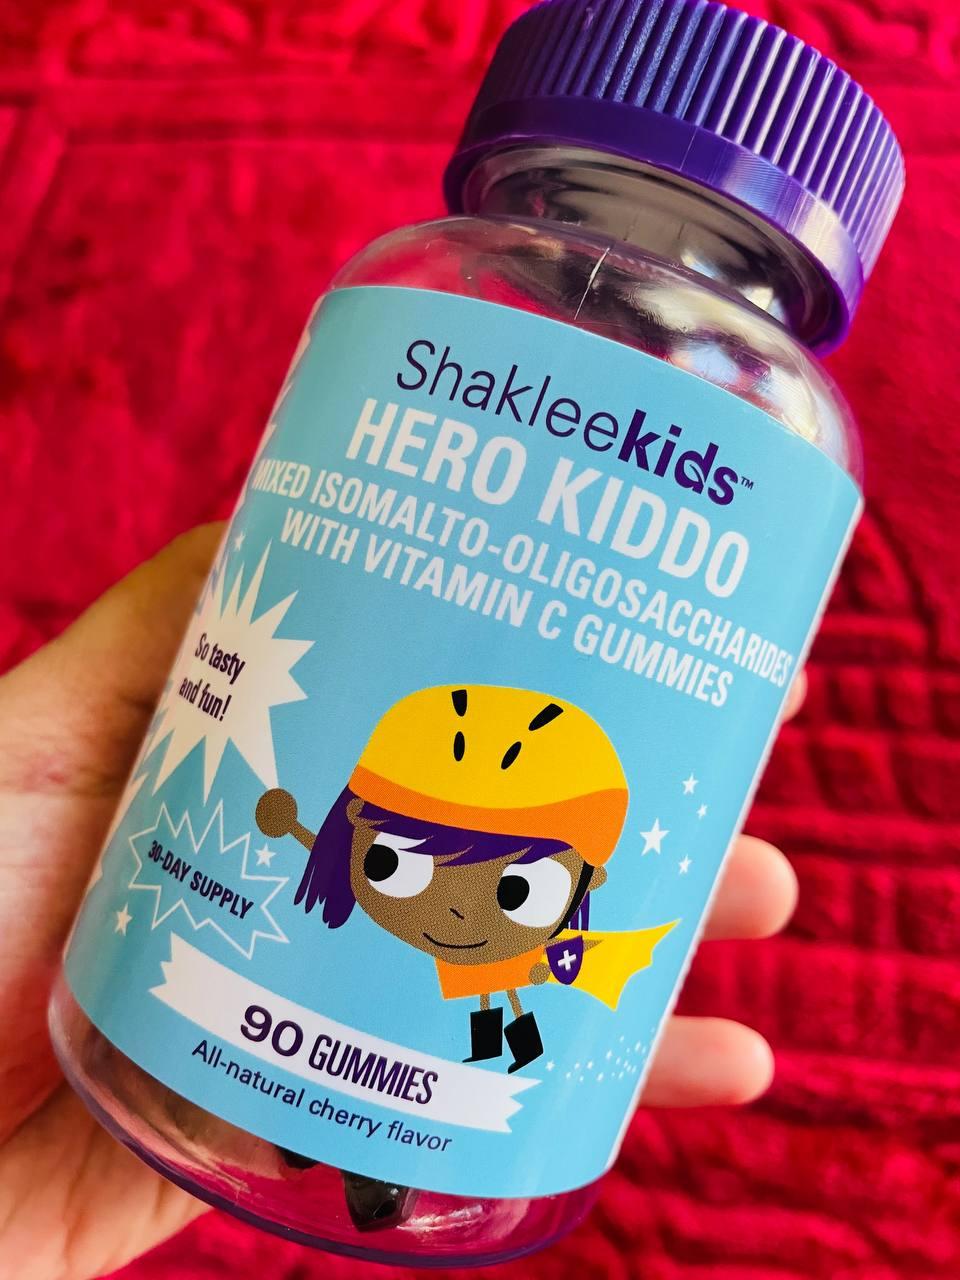 Produk Baru Shaklee untuk Kanak-Kanak: Hero Kiddo Shaklee